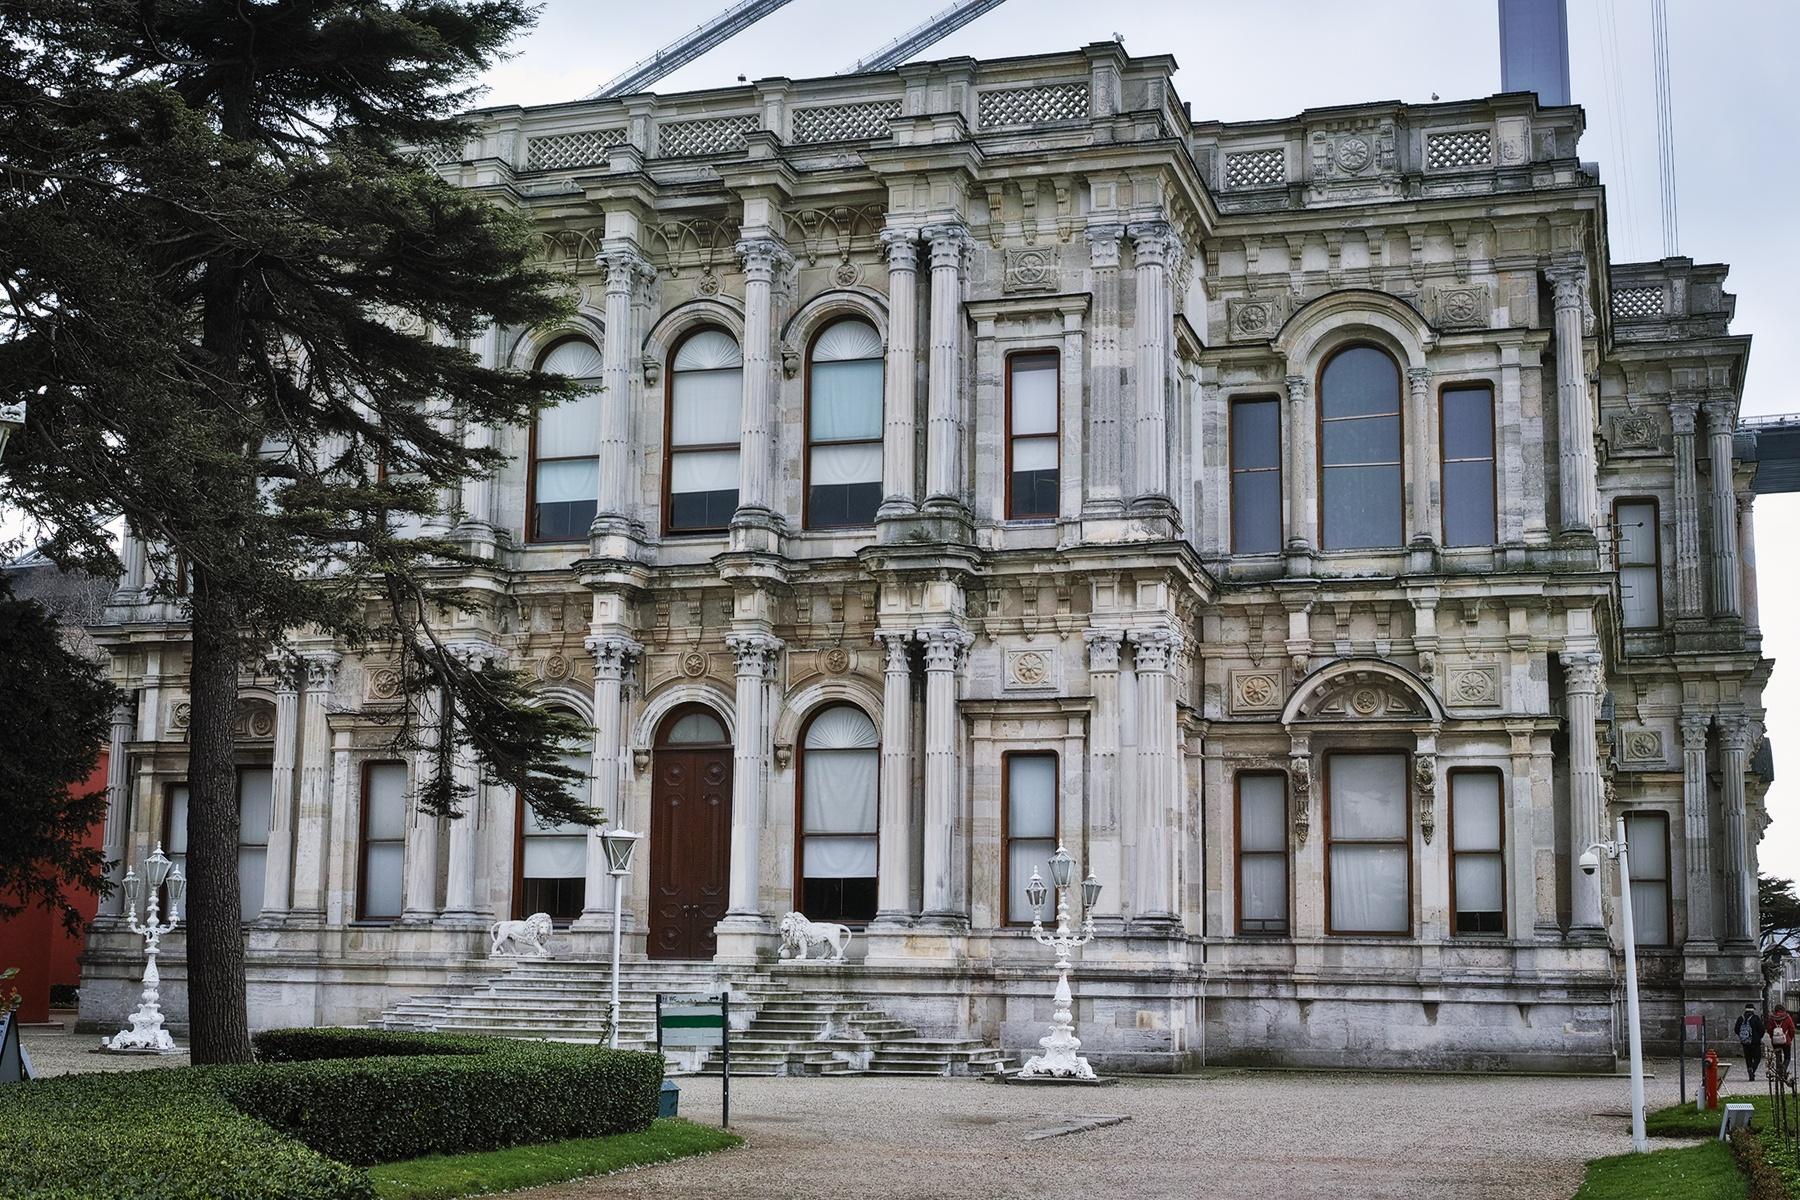 Beylerbeyi Palace by Osman Tümay